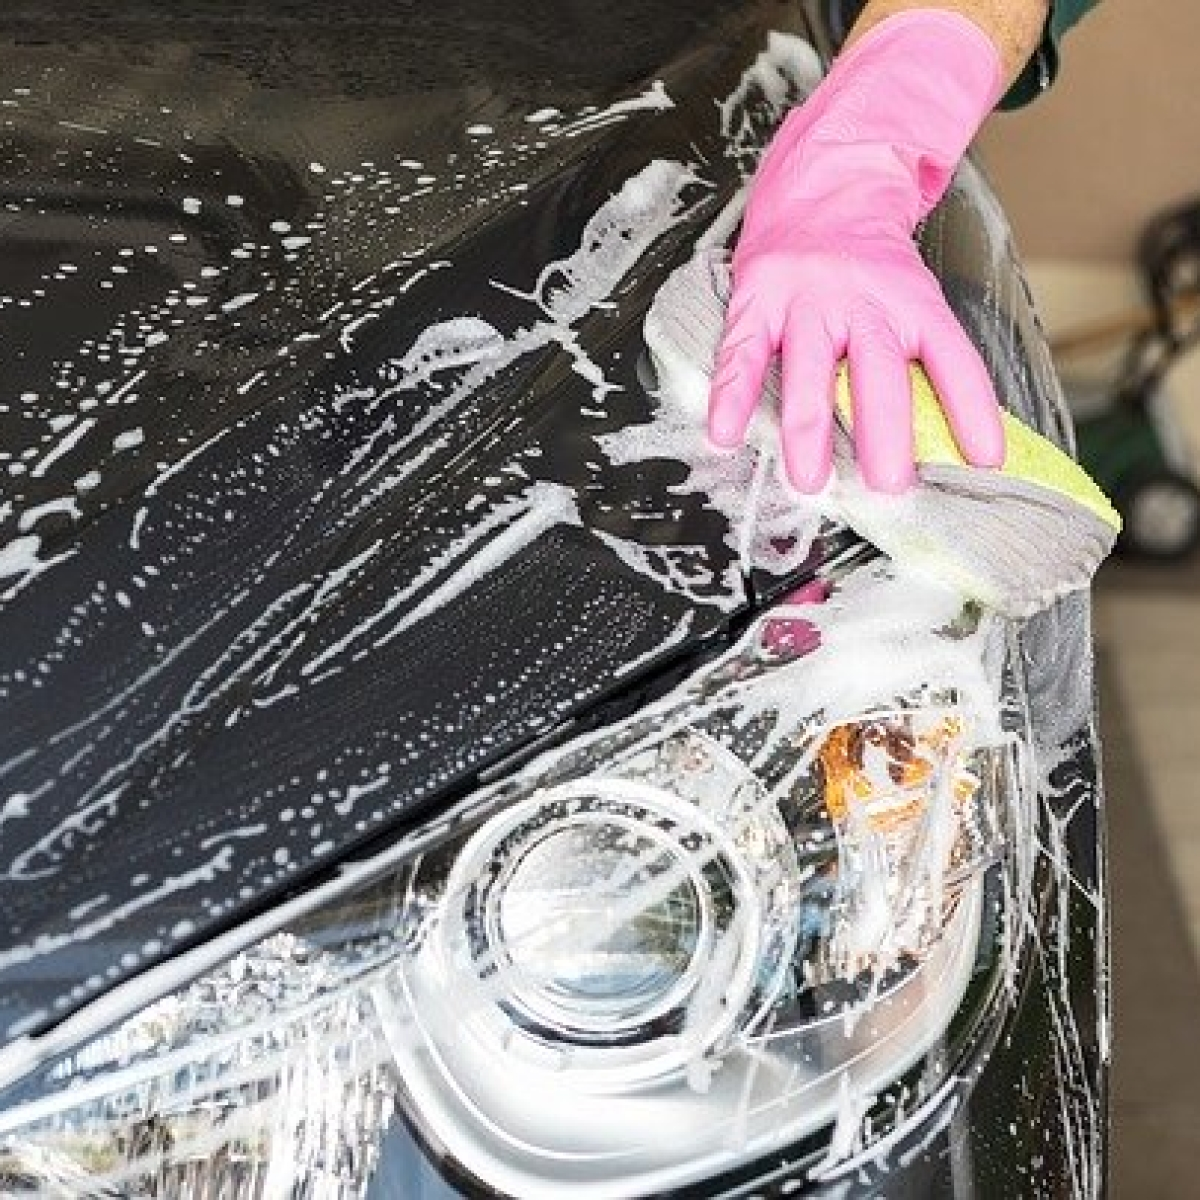 Breaking Good: Goa's drug dealers start washing cars, selling fruits to make ends meet